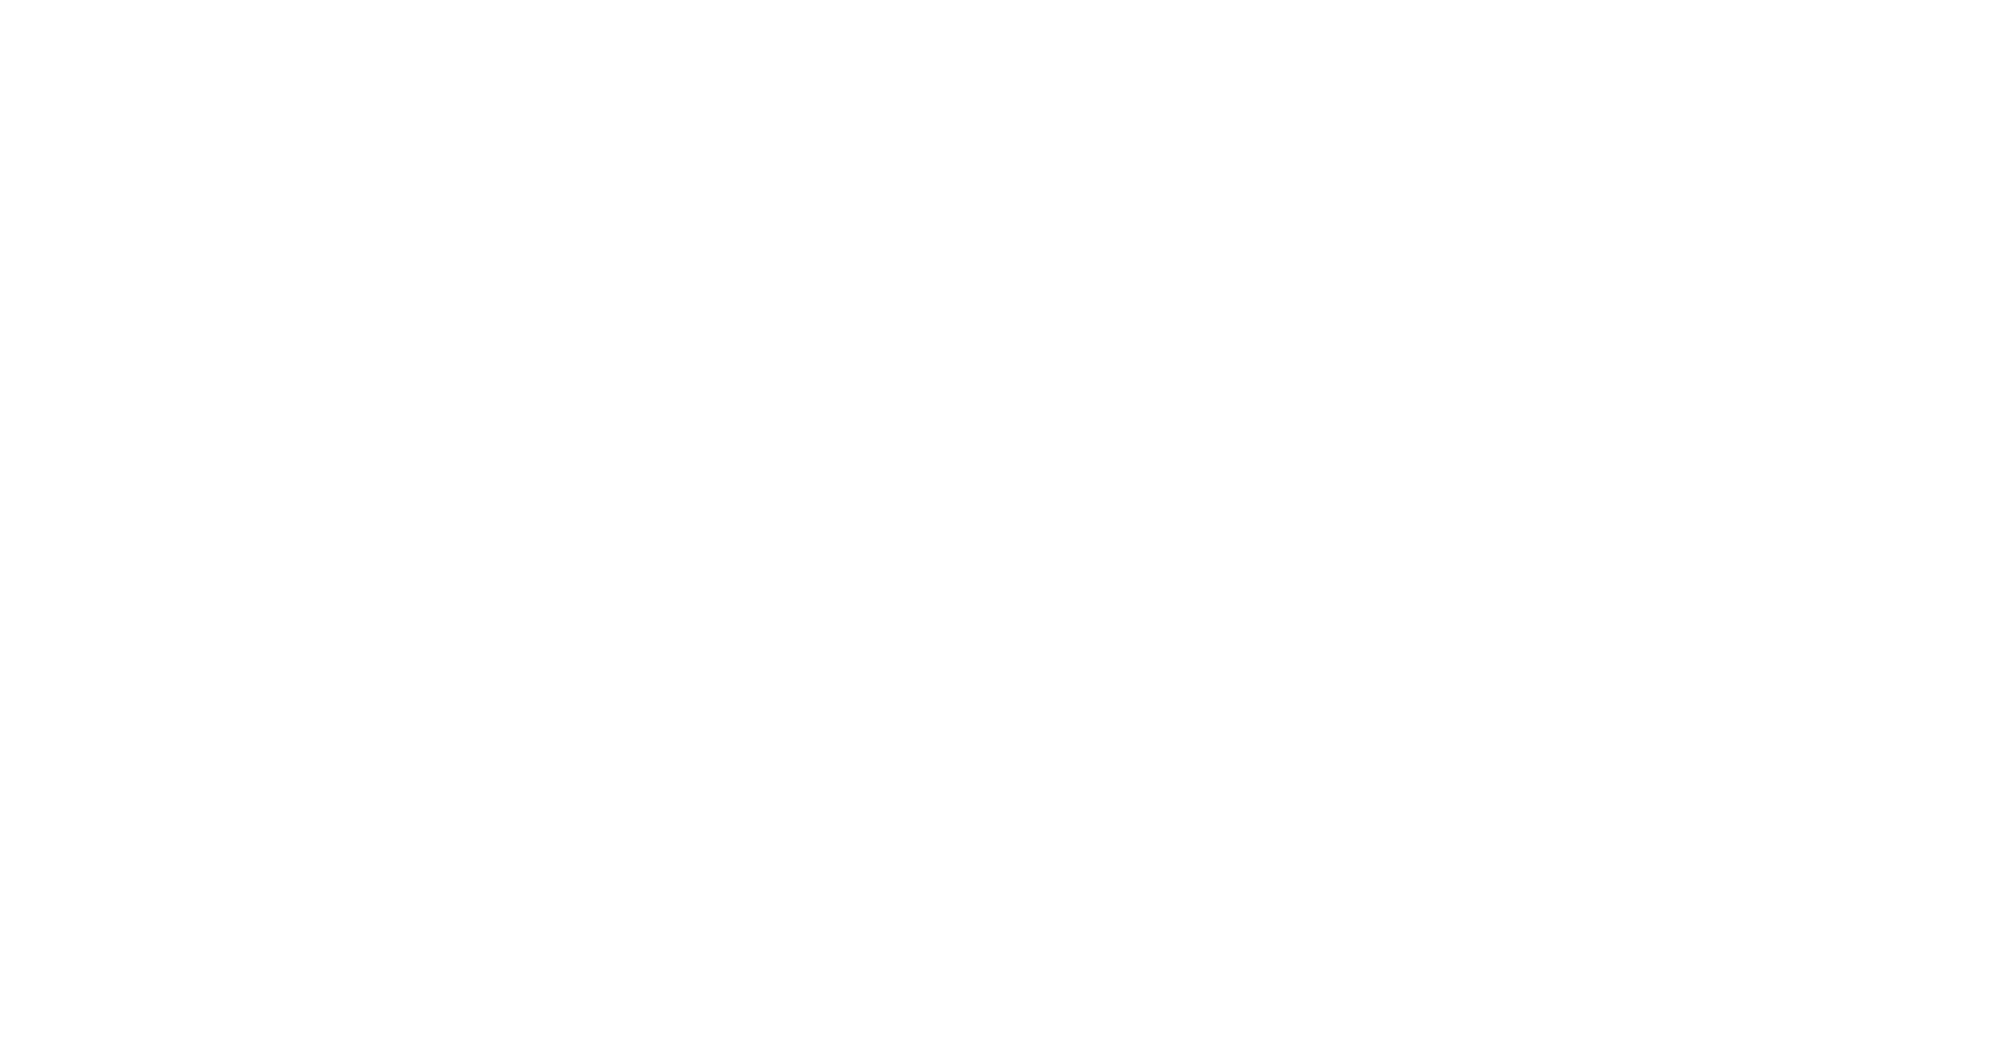 ultradent logo styleitaliano products